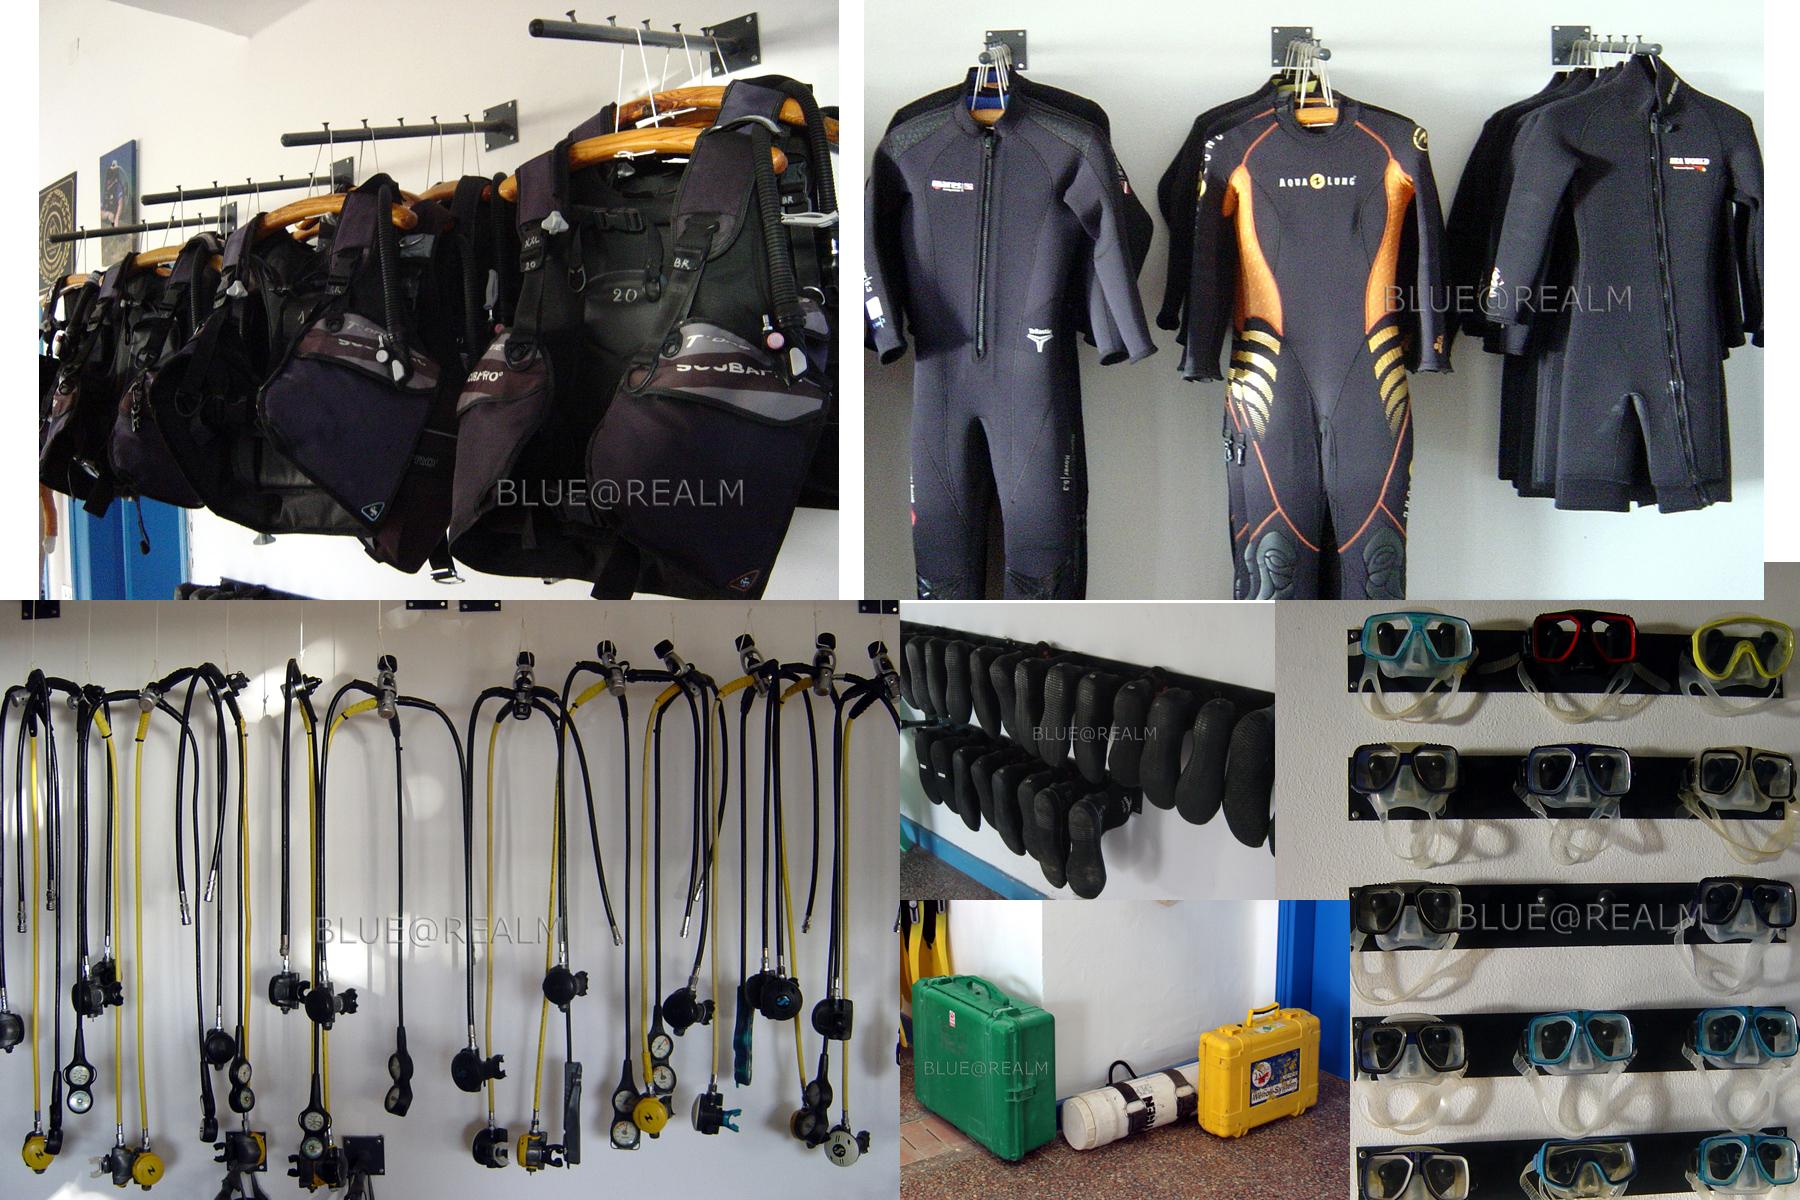 Scuba Diving & Snorkeling equipment for rent